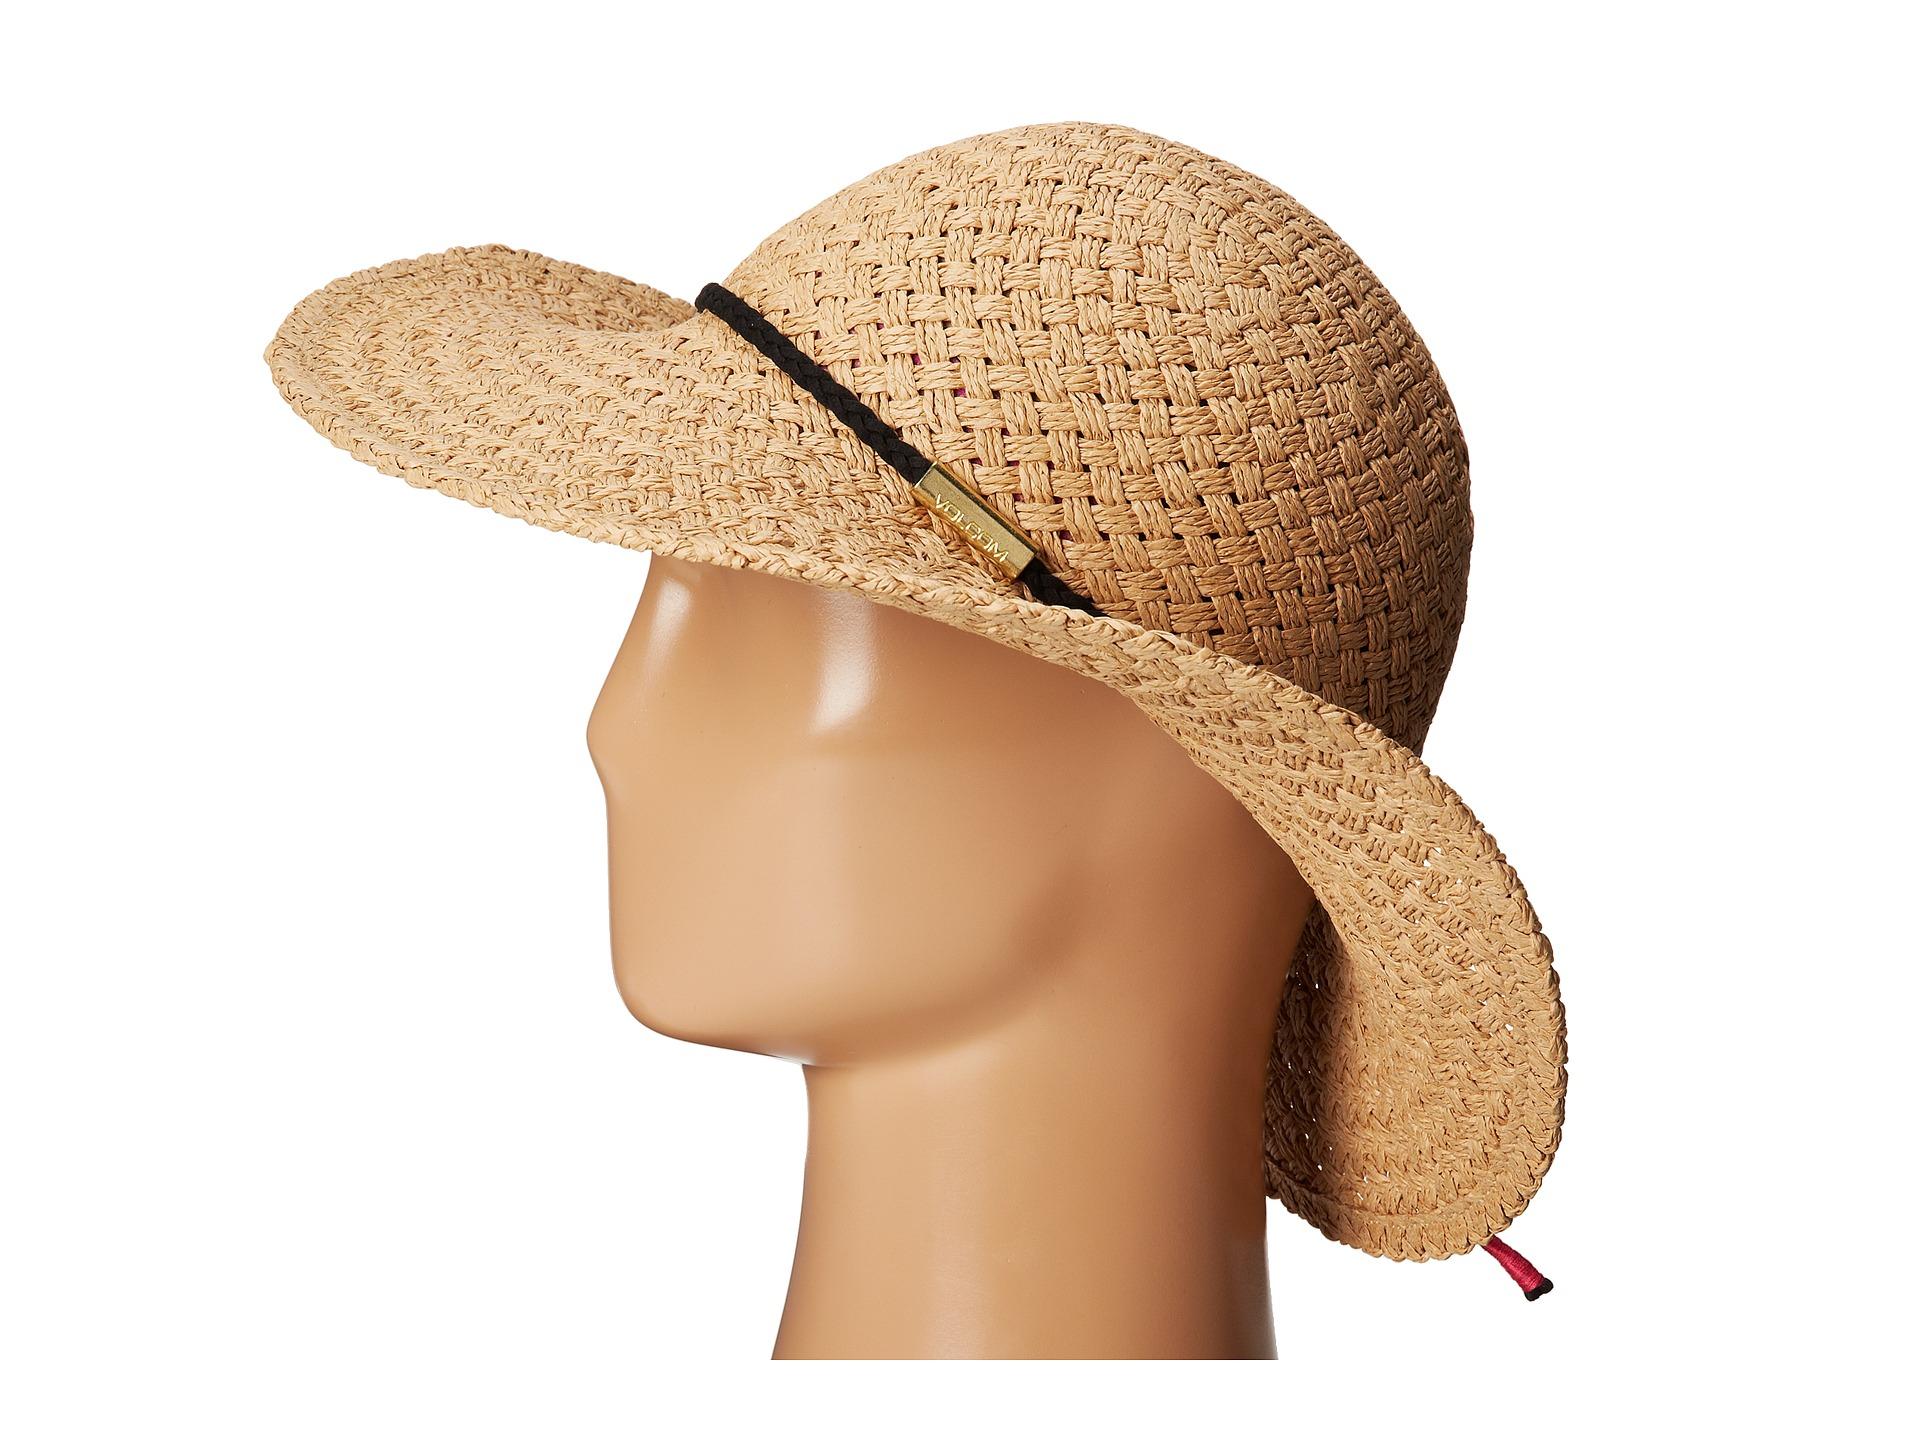 dfe8d338a3c Lyst - Volcom Head Trip Floppy Hat in Brown